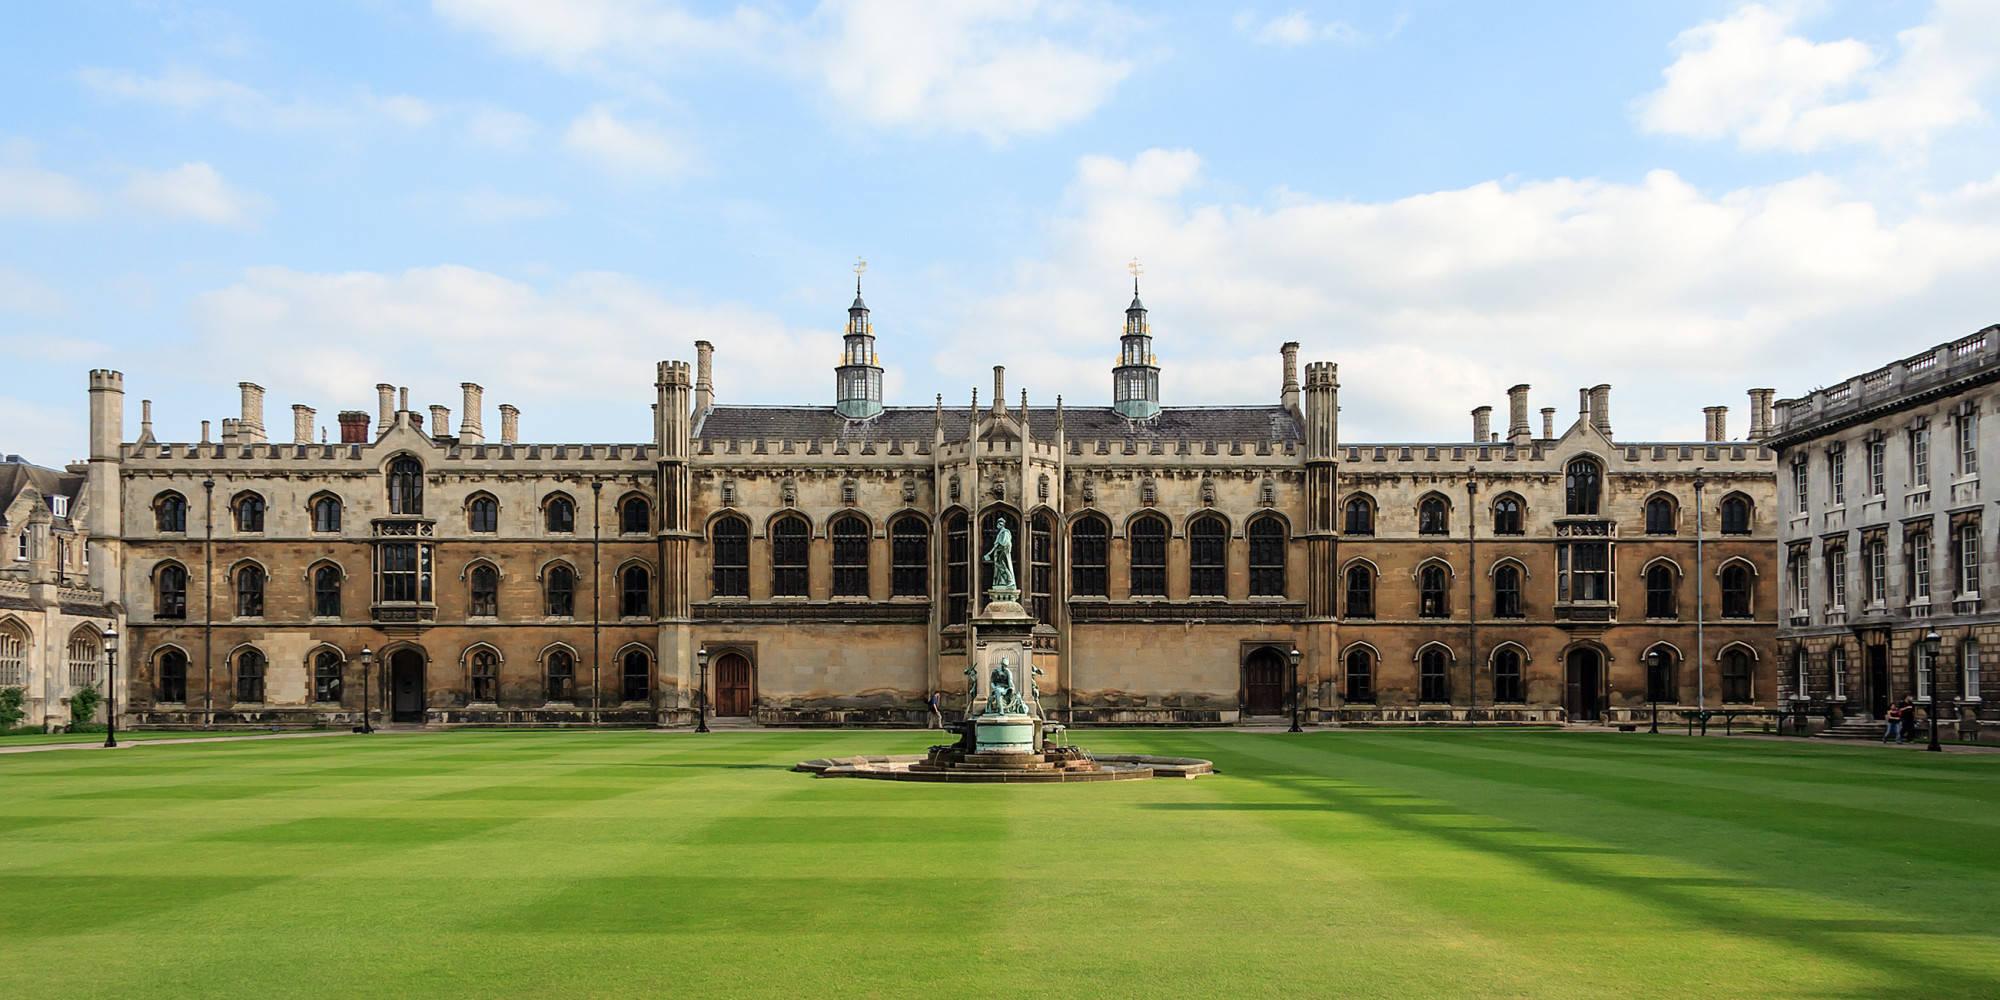 Cambridge(FILEminimizer)